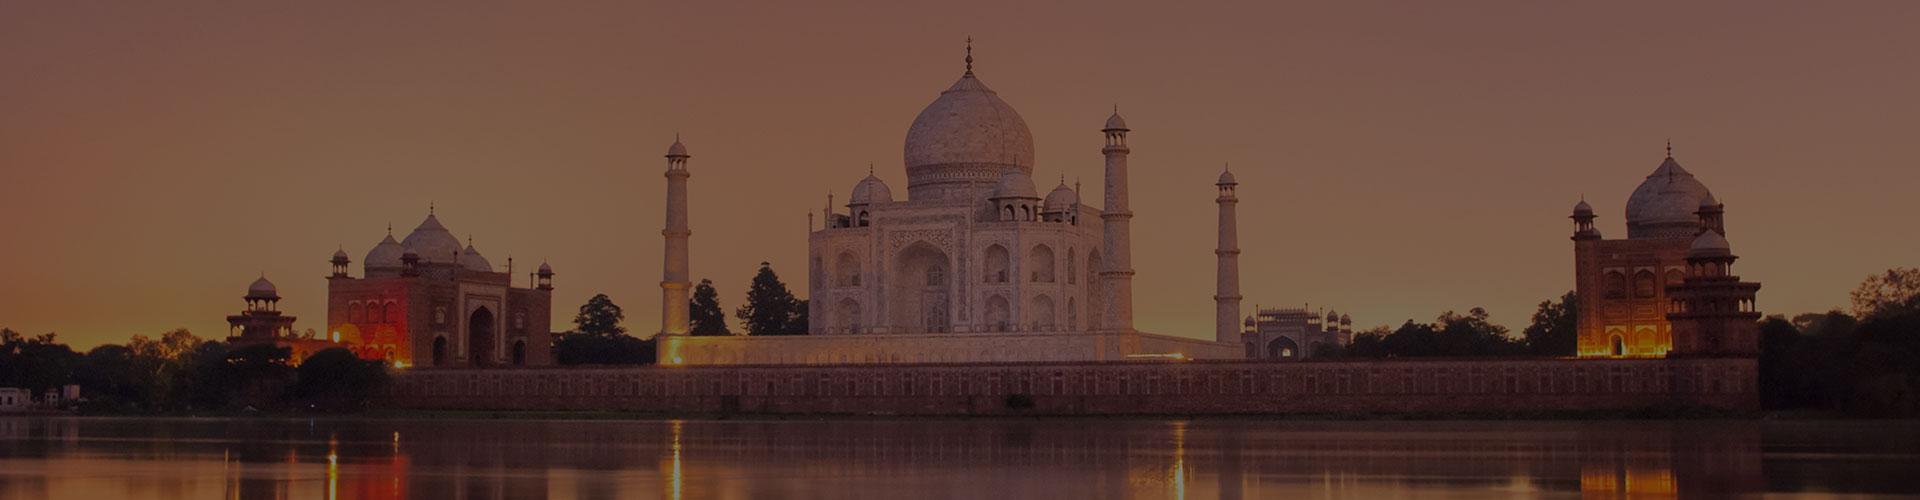 Landmark photograph of India